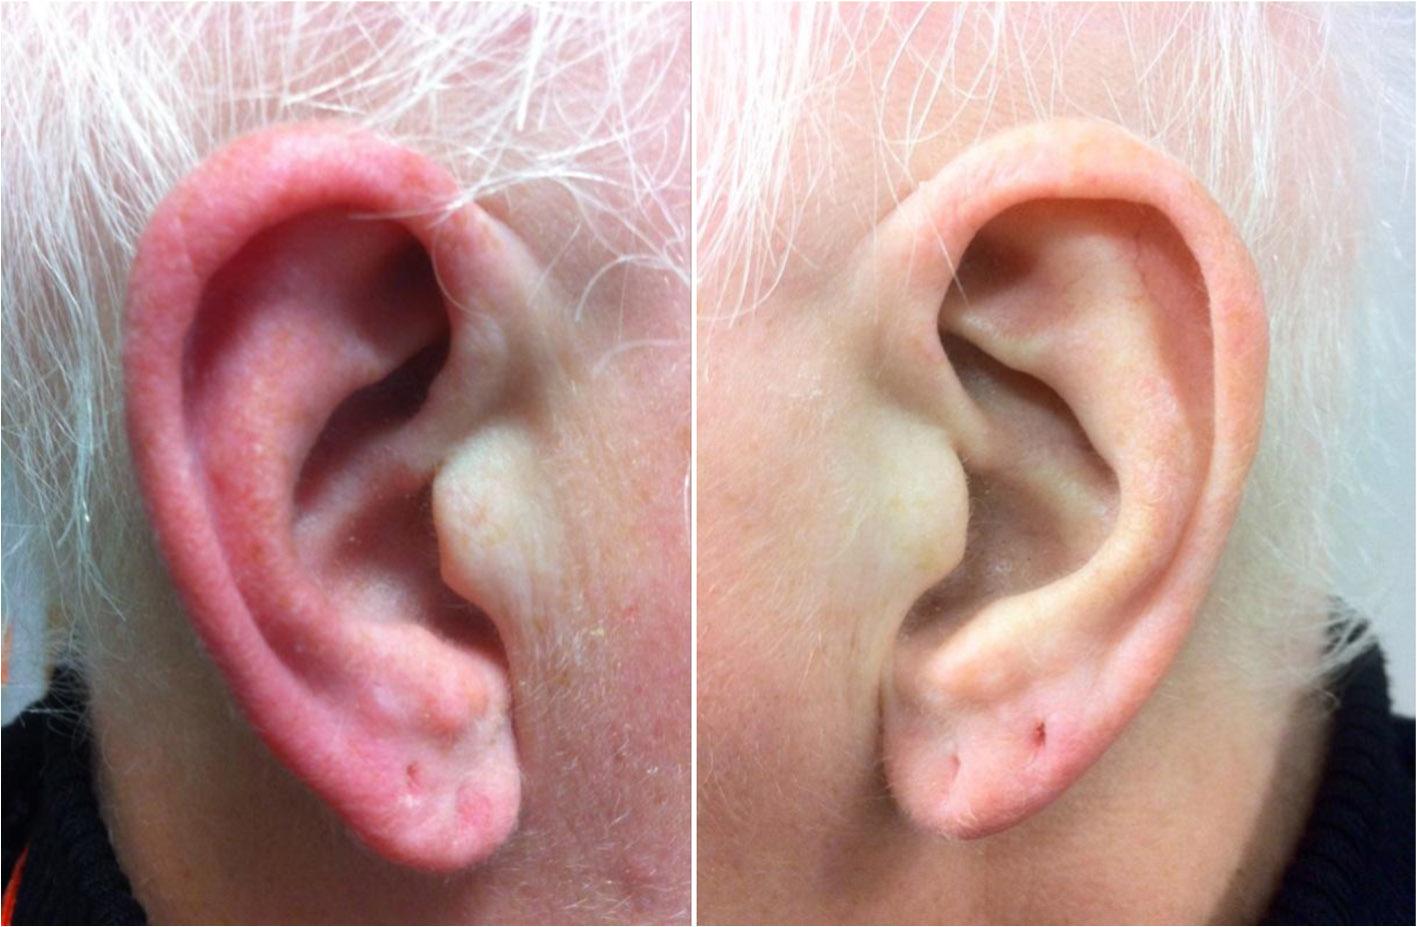 causes oreille gauche chauffe rouge